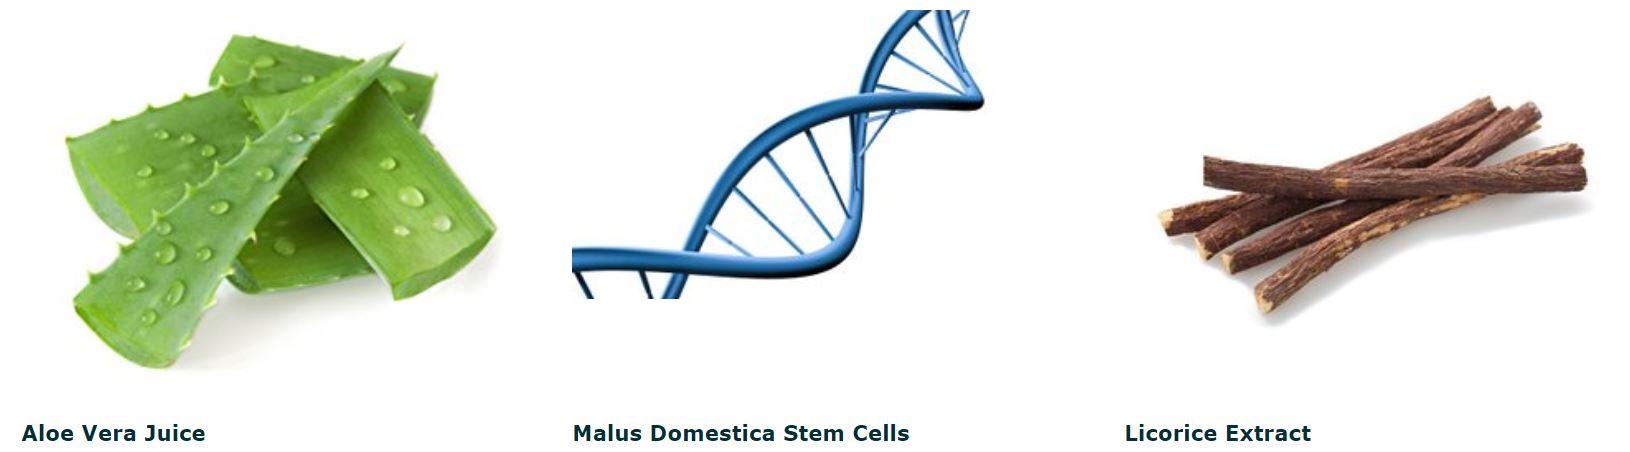 aloe vera stem cells licorice extract images